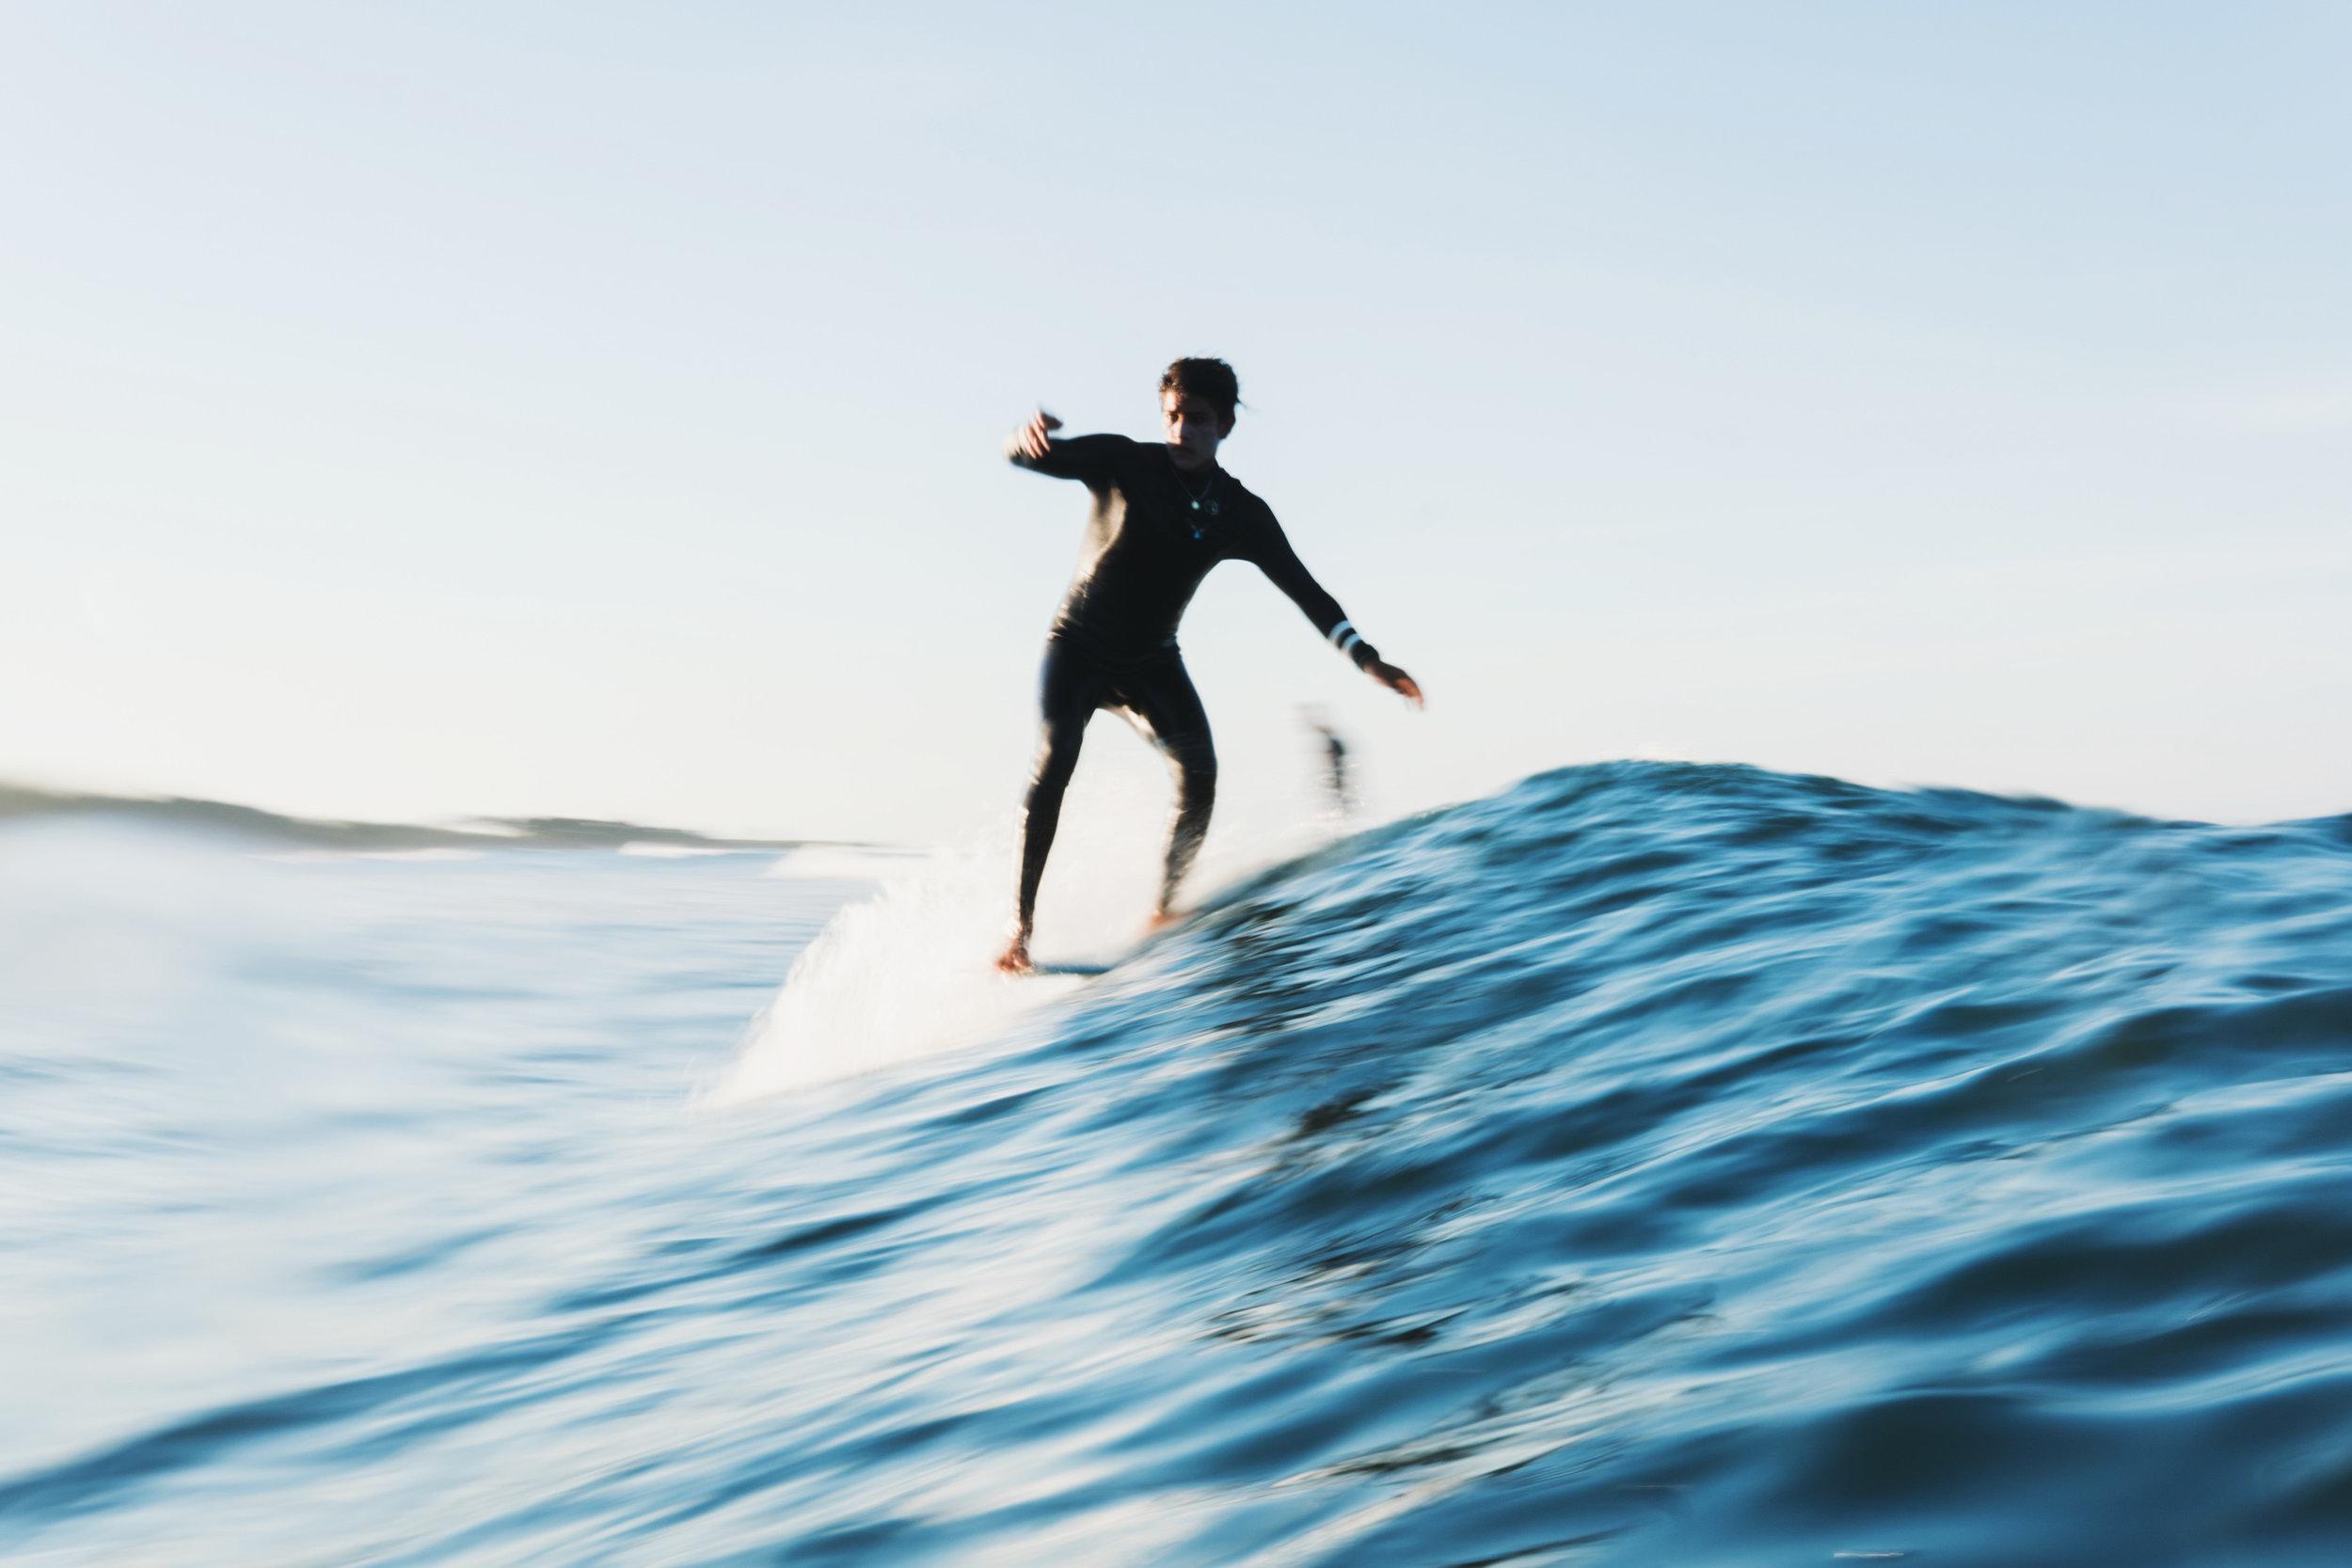 Surf-Mexico-Zihuatanejo-Sayulita-Ixtapa-Zihuatanejo-Diego-Cadena-Olas-Fotografia-Heiko-Bothe-3.jpg